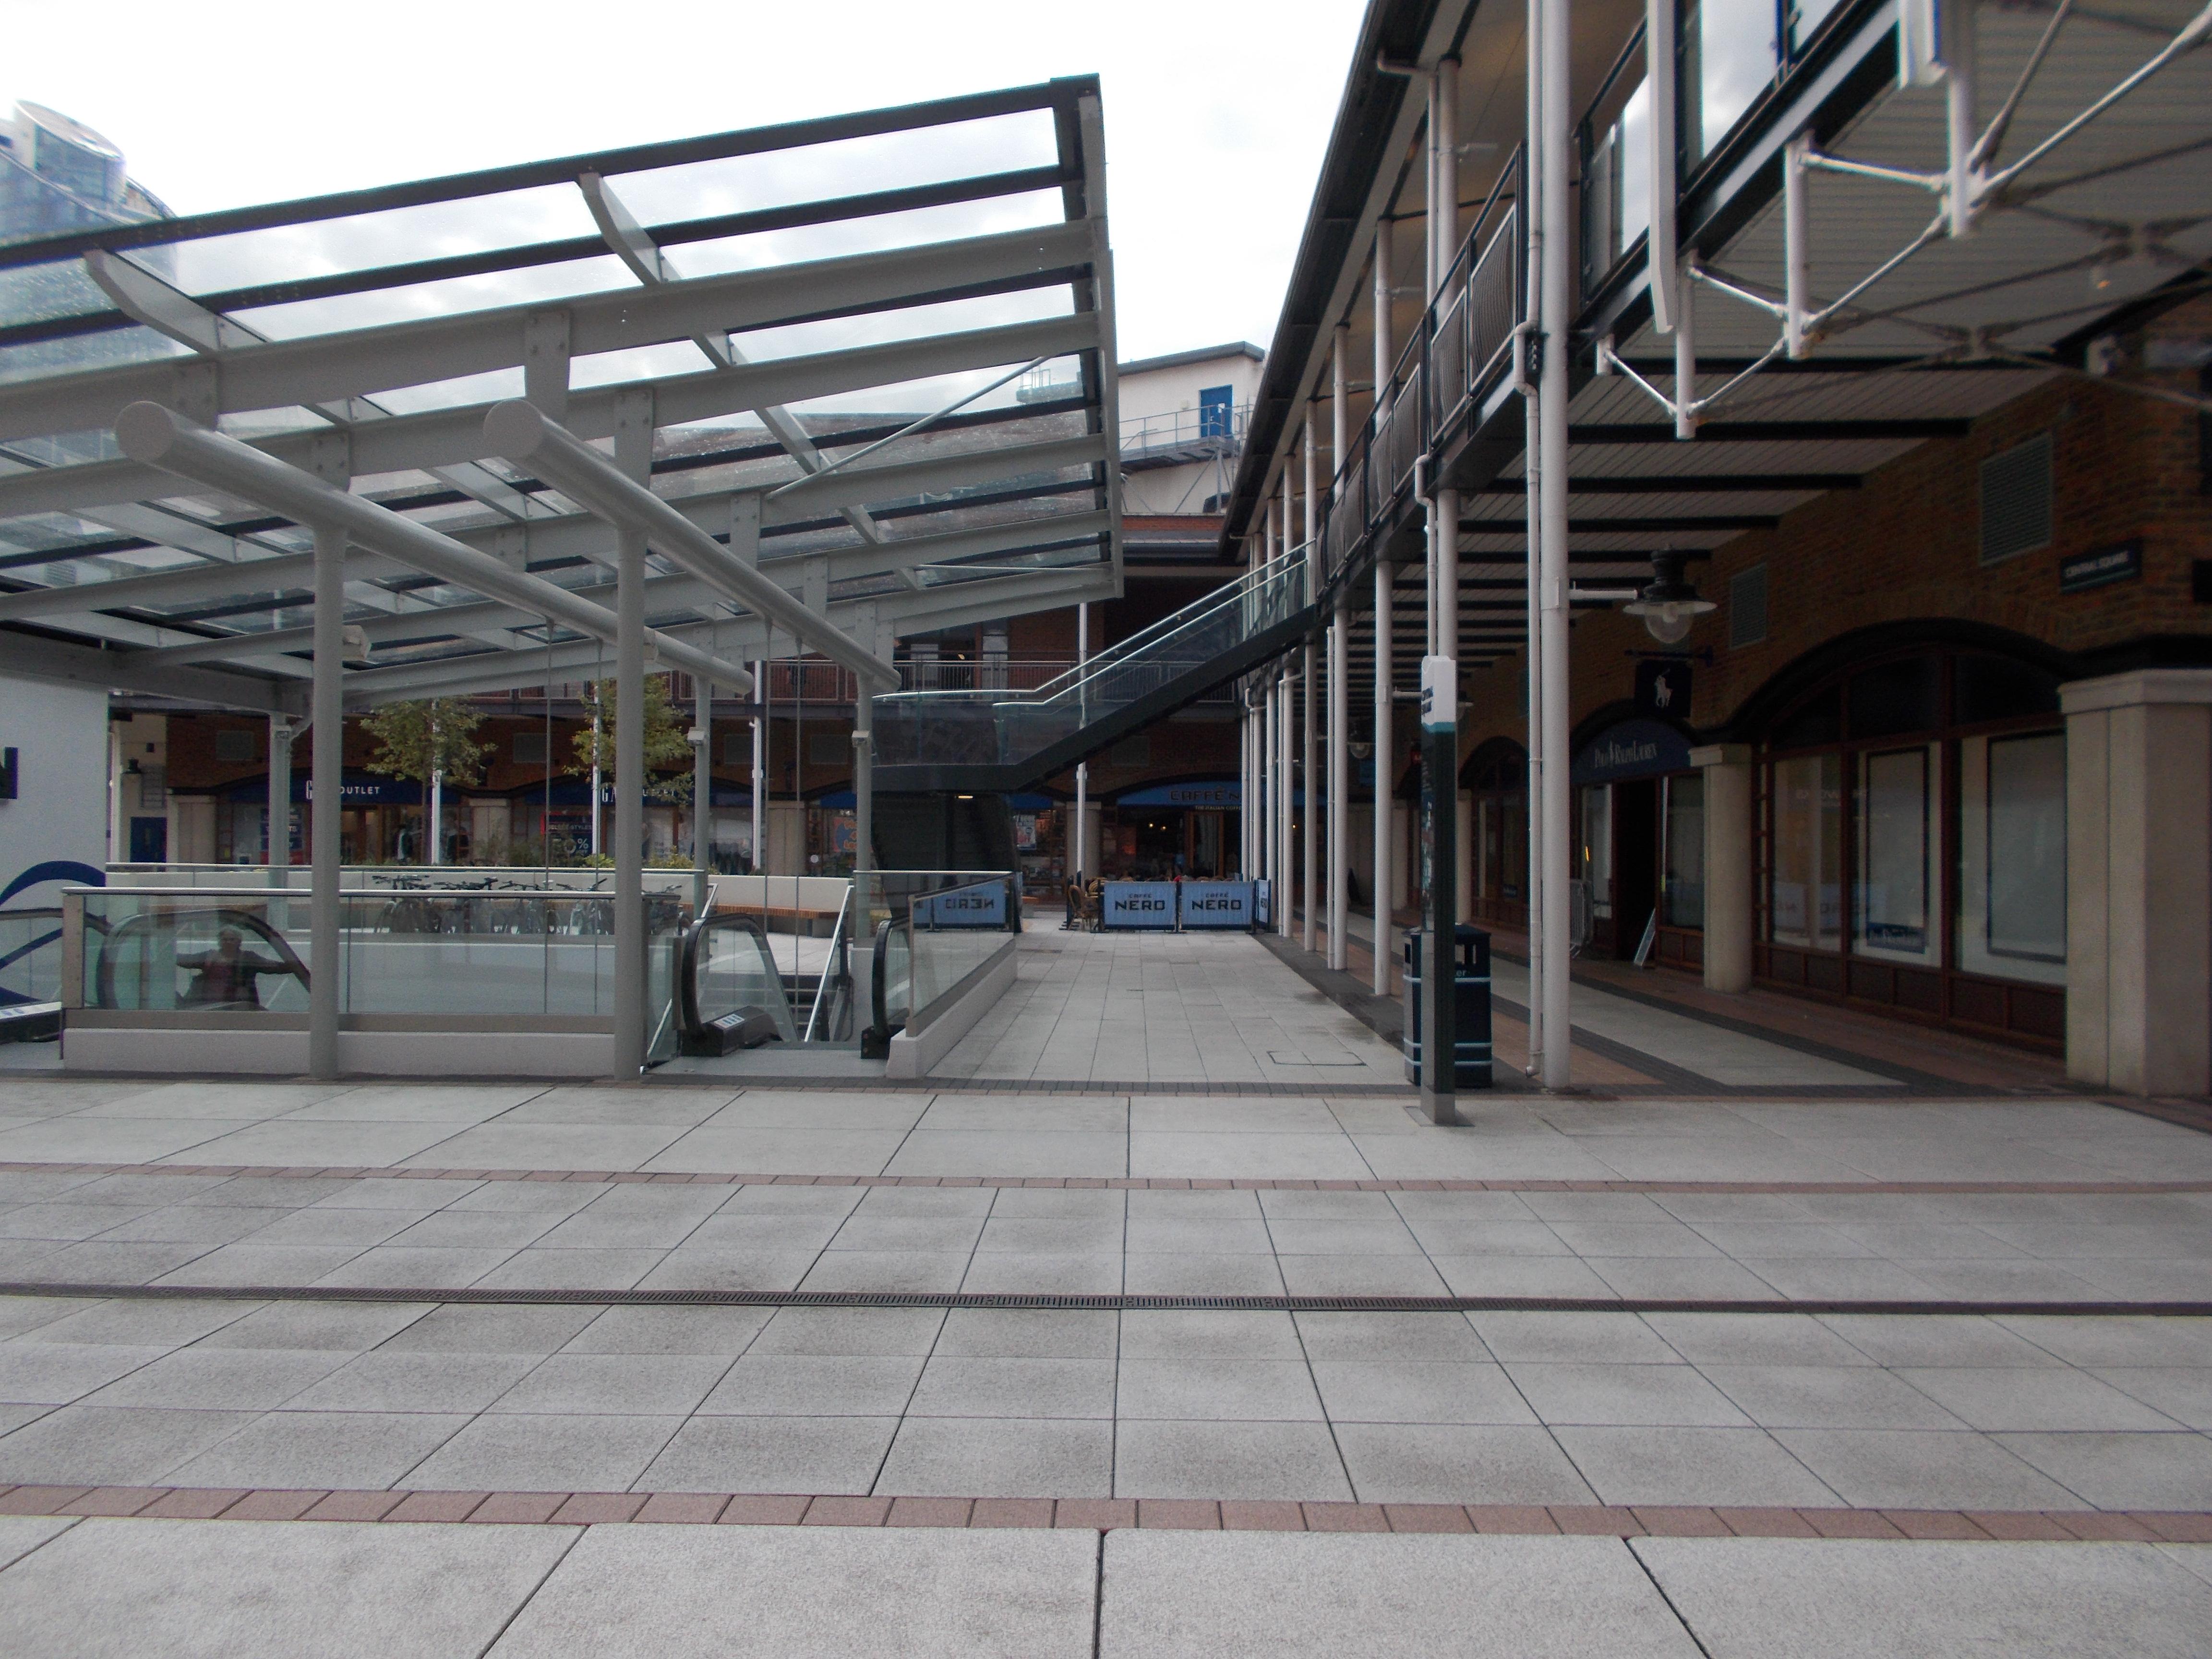 H.Monfared Commercial Groundworks